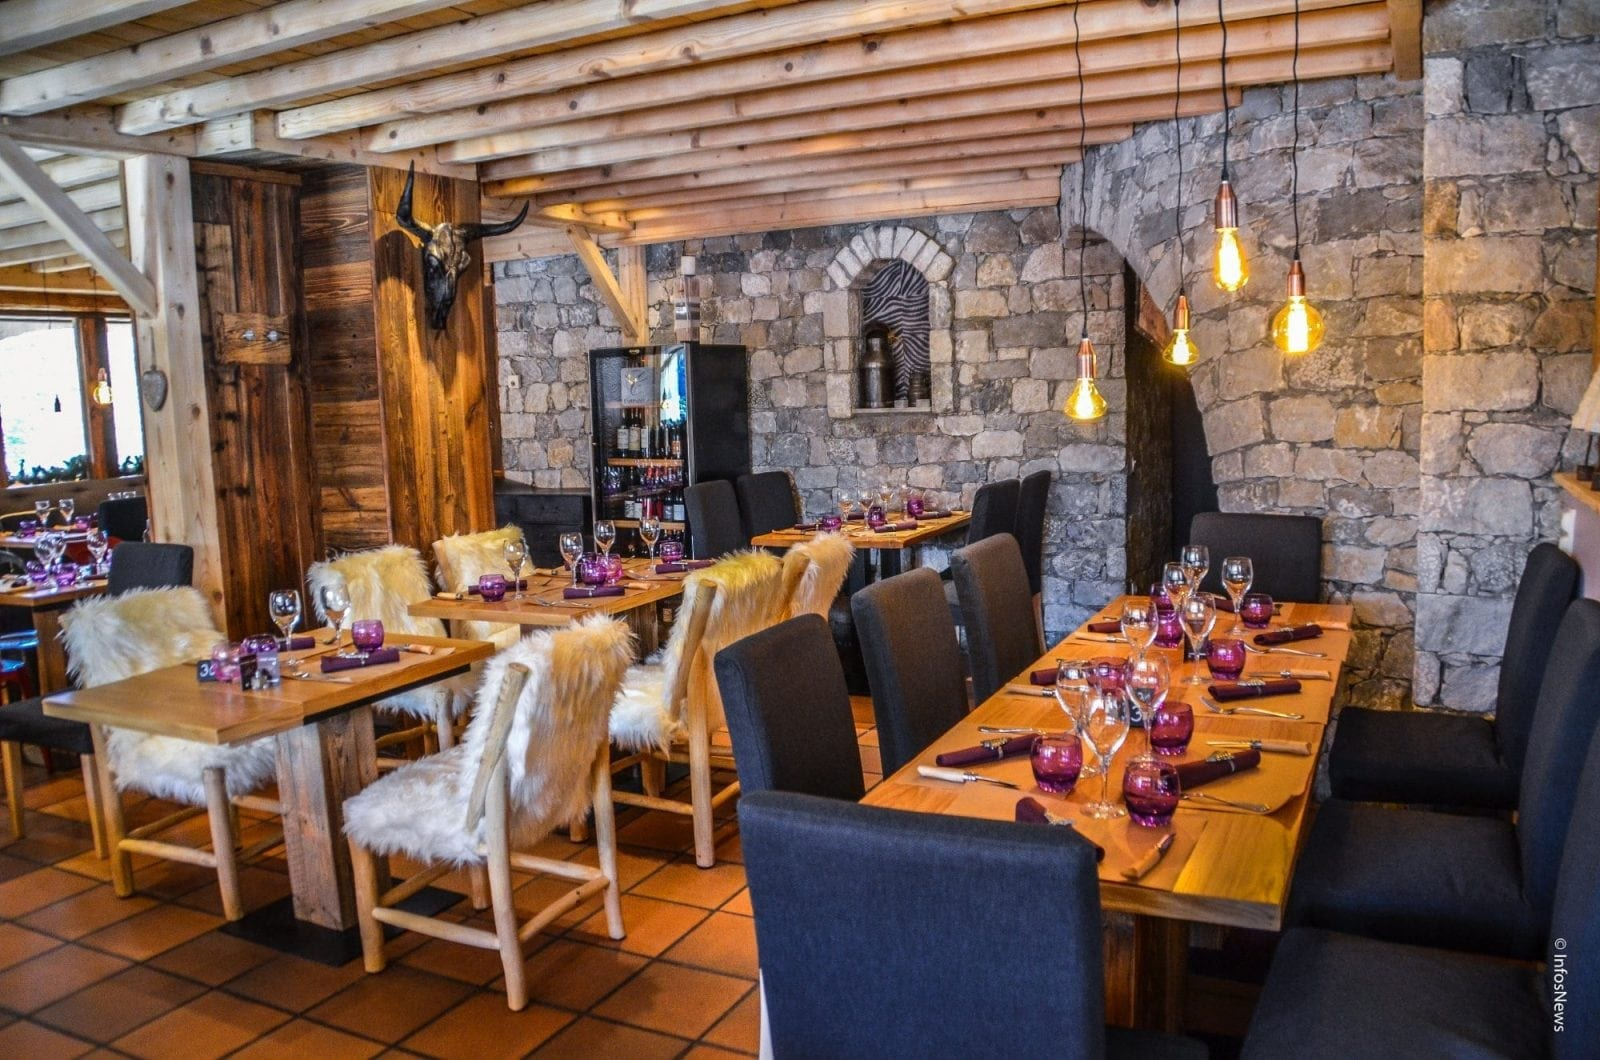 7.La Marmite St. Moritz Switzerland - Top 10 restaurante cu stele Michelin din Europa